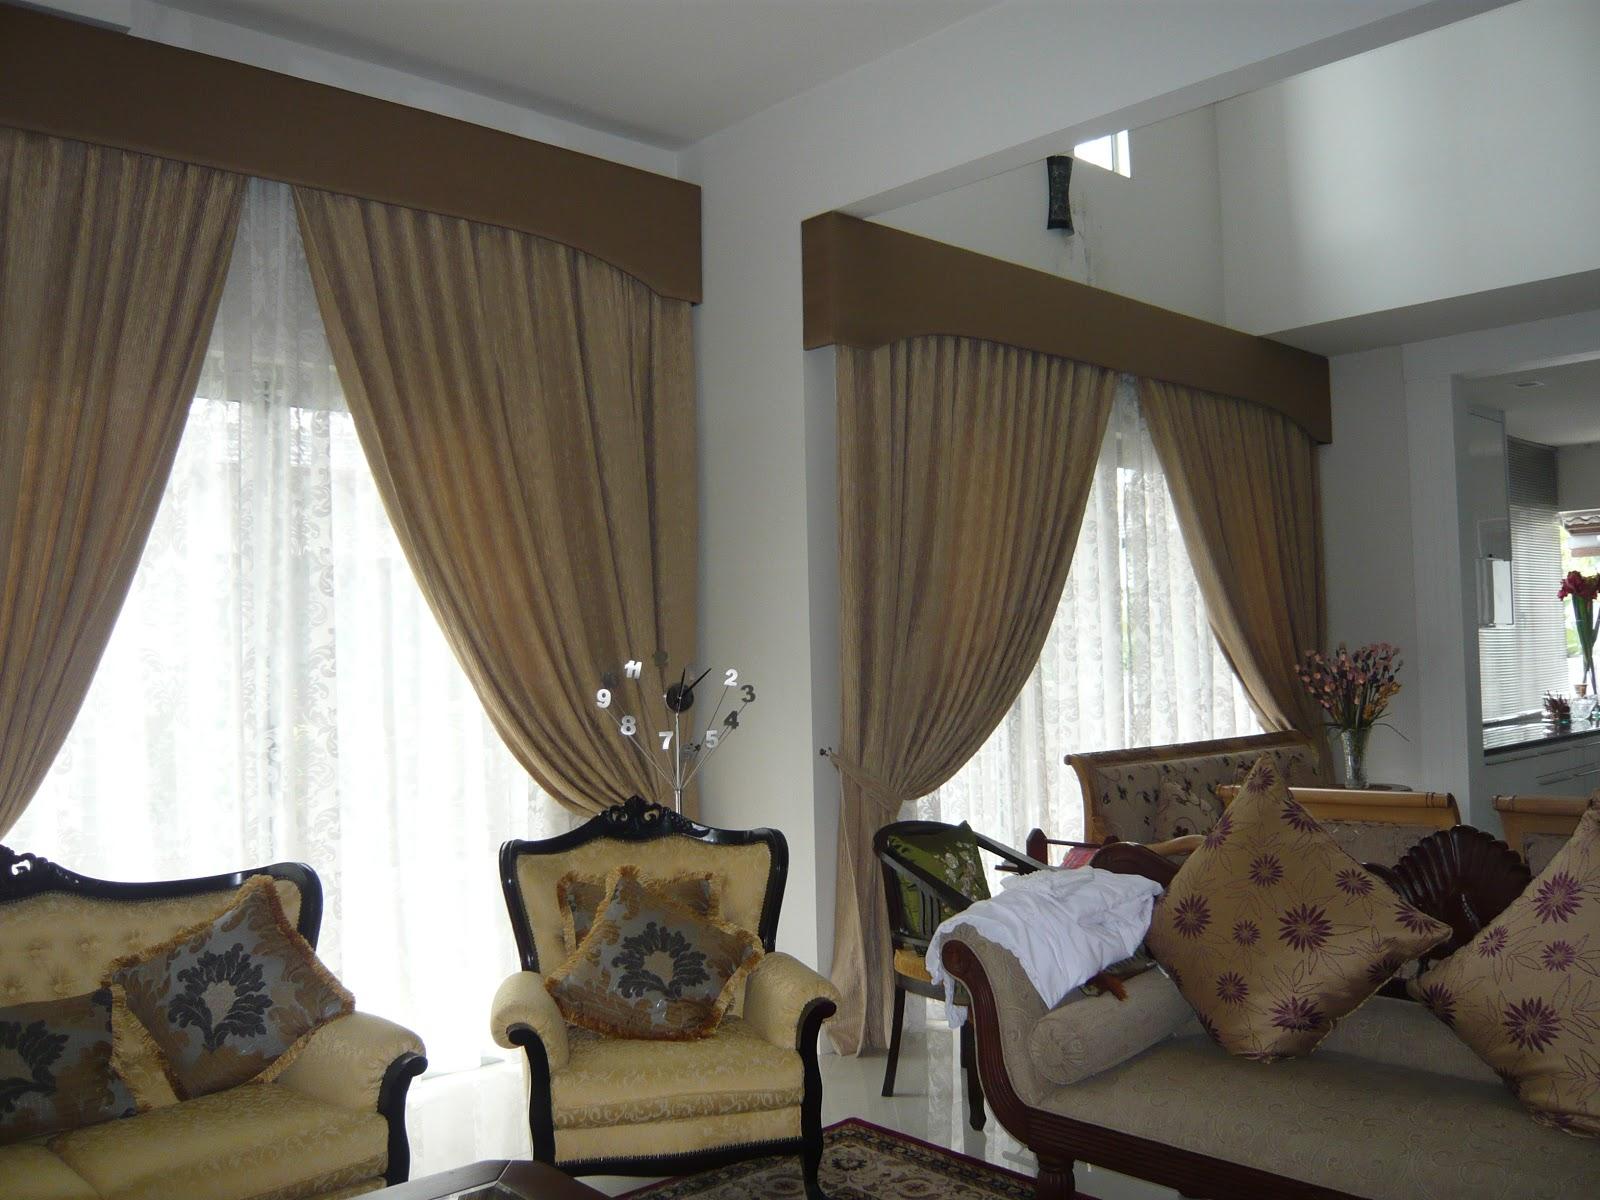 Repair Sofa Cushion Shah Alam Chester Barato Home Furnishings And Interior Design